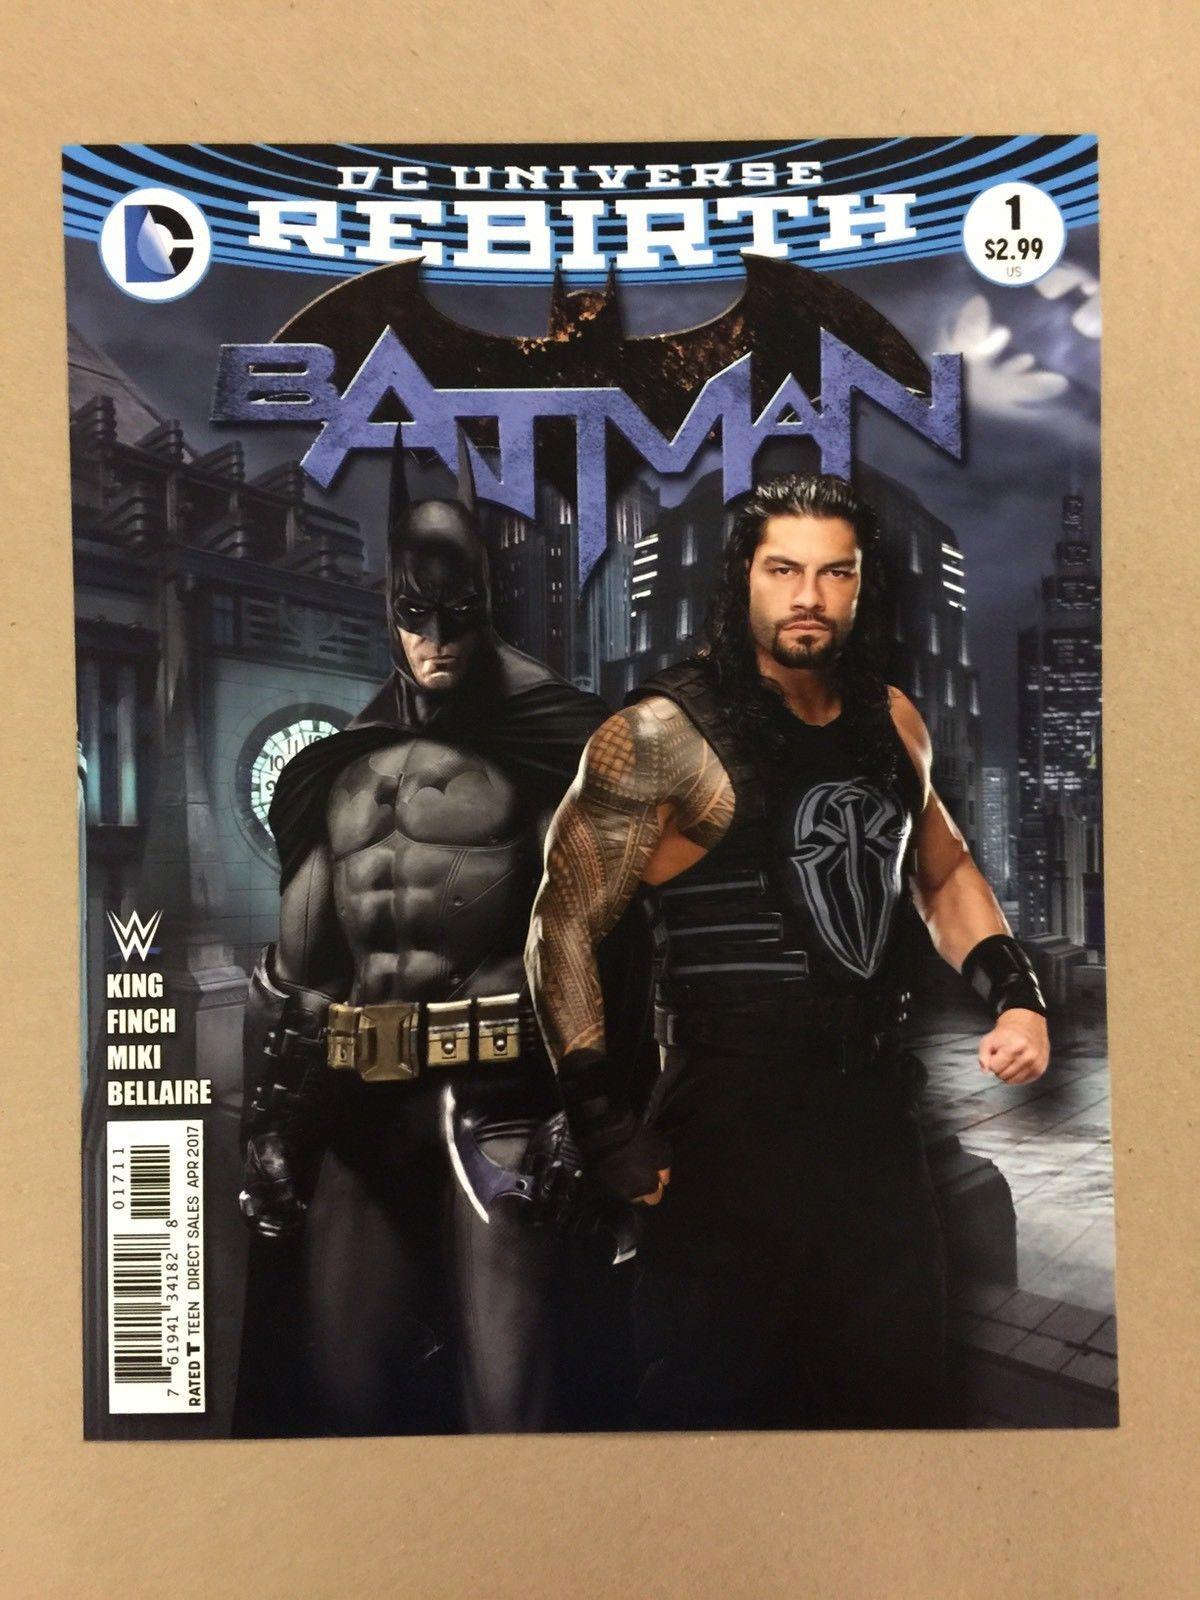 Roman Reigns Wwe 8x10 Photo Dc Comic Book Cover Batman Wrestlemania The Shield Http Bestsellerlist Co Uk Roman Reign Roman Reigns Dc Comic Books 8x10 Photo